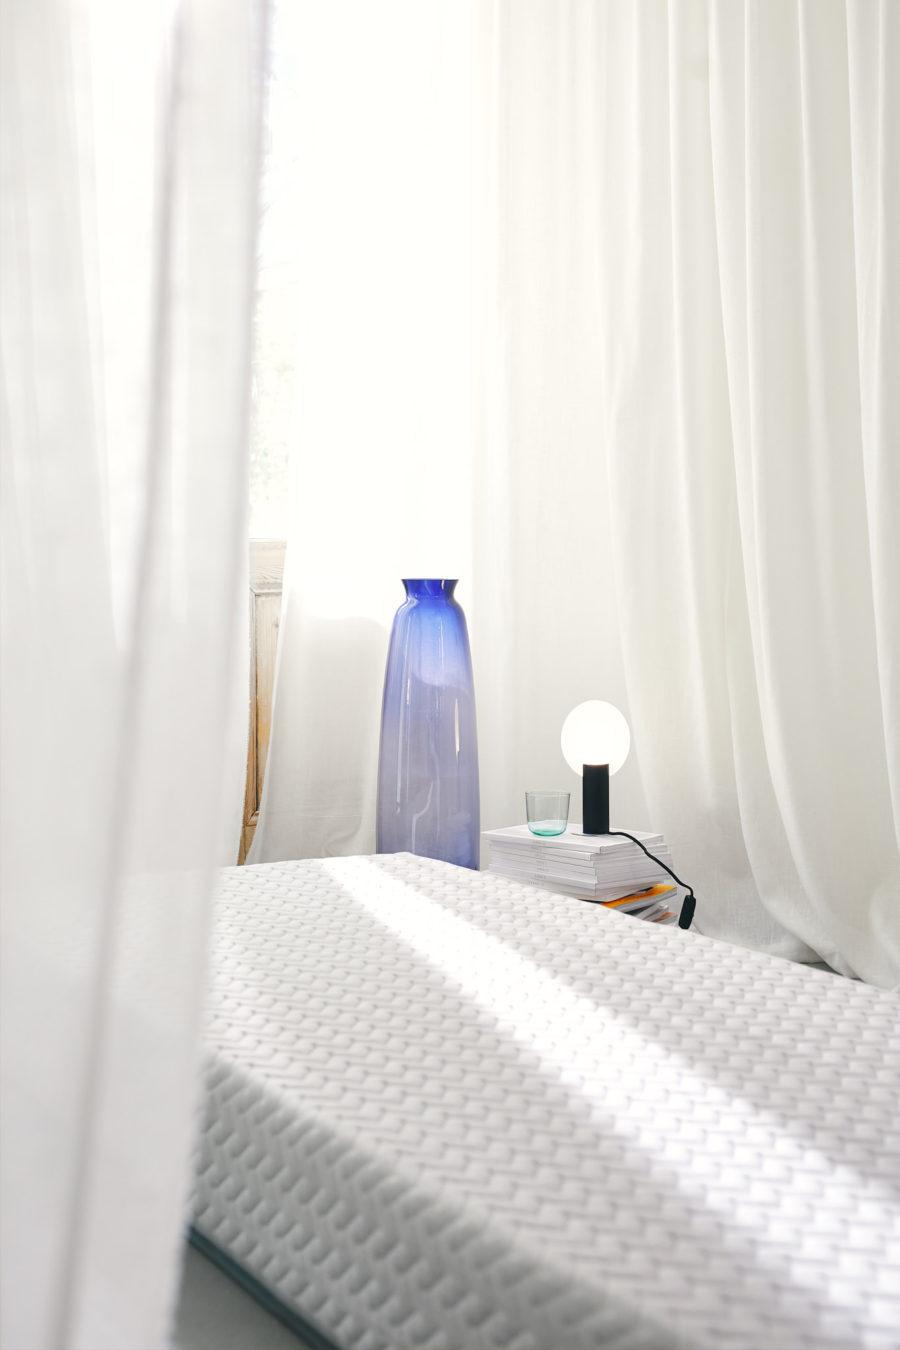 circular mattress with blue vase